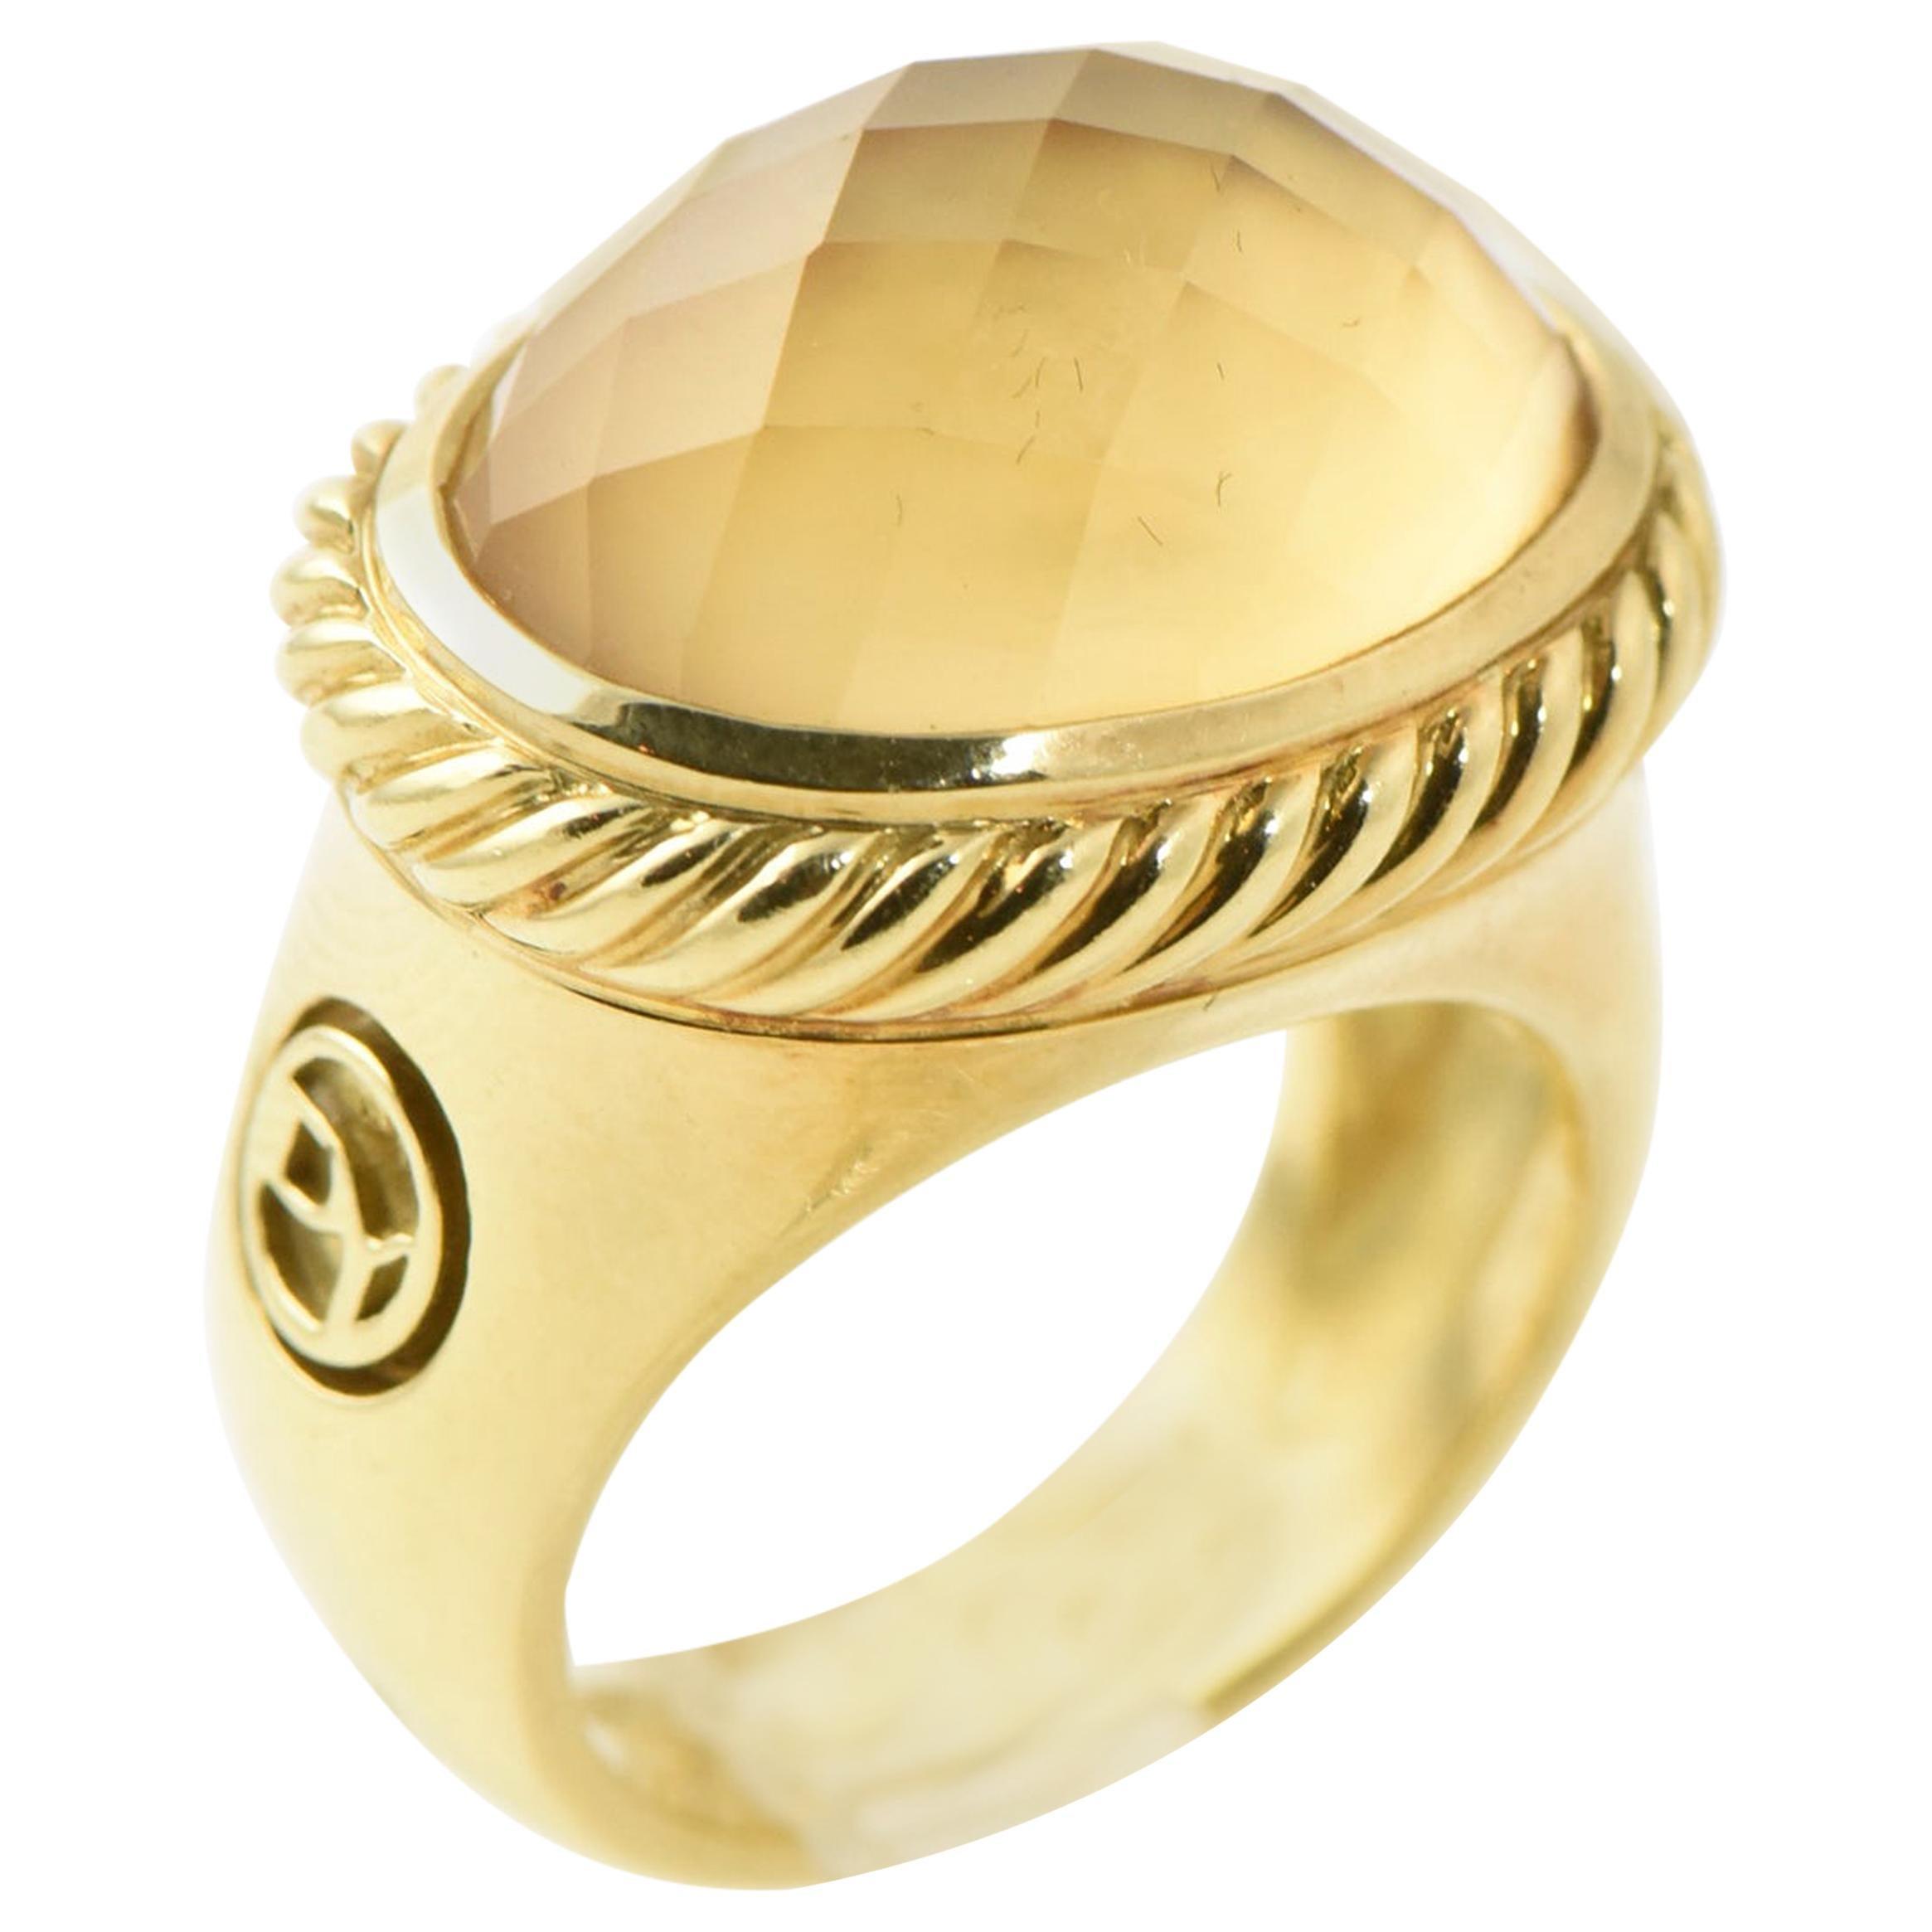 David Yurman Citrine Yellow Gold Signature Ring